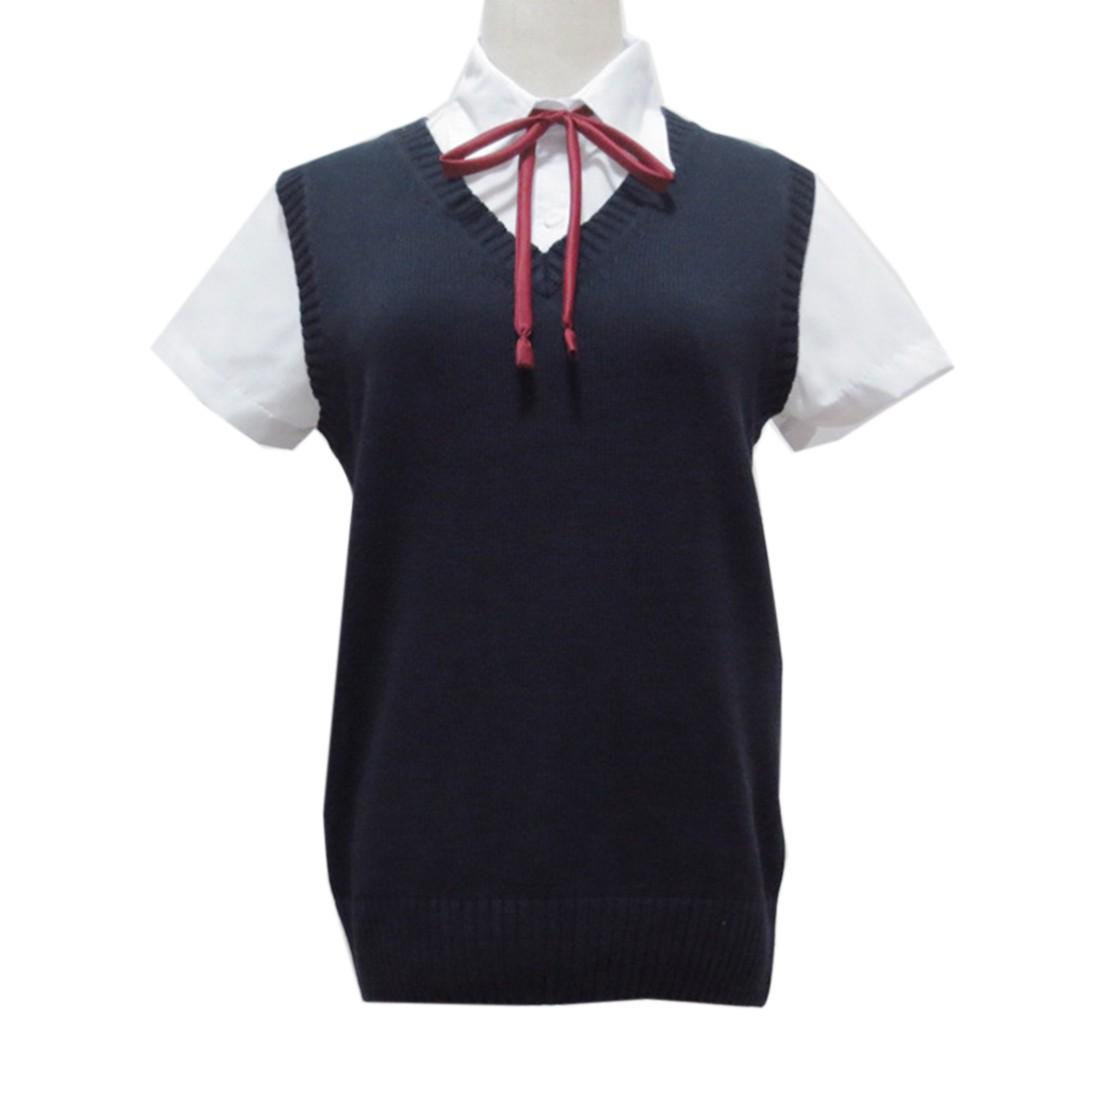 Women Sleeveless V Neck Cotton Knitting Sweater School Girls JK ...